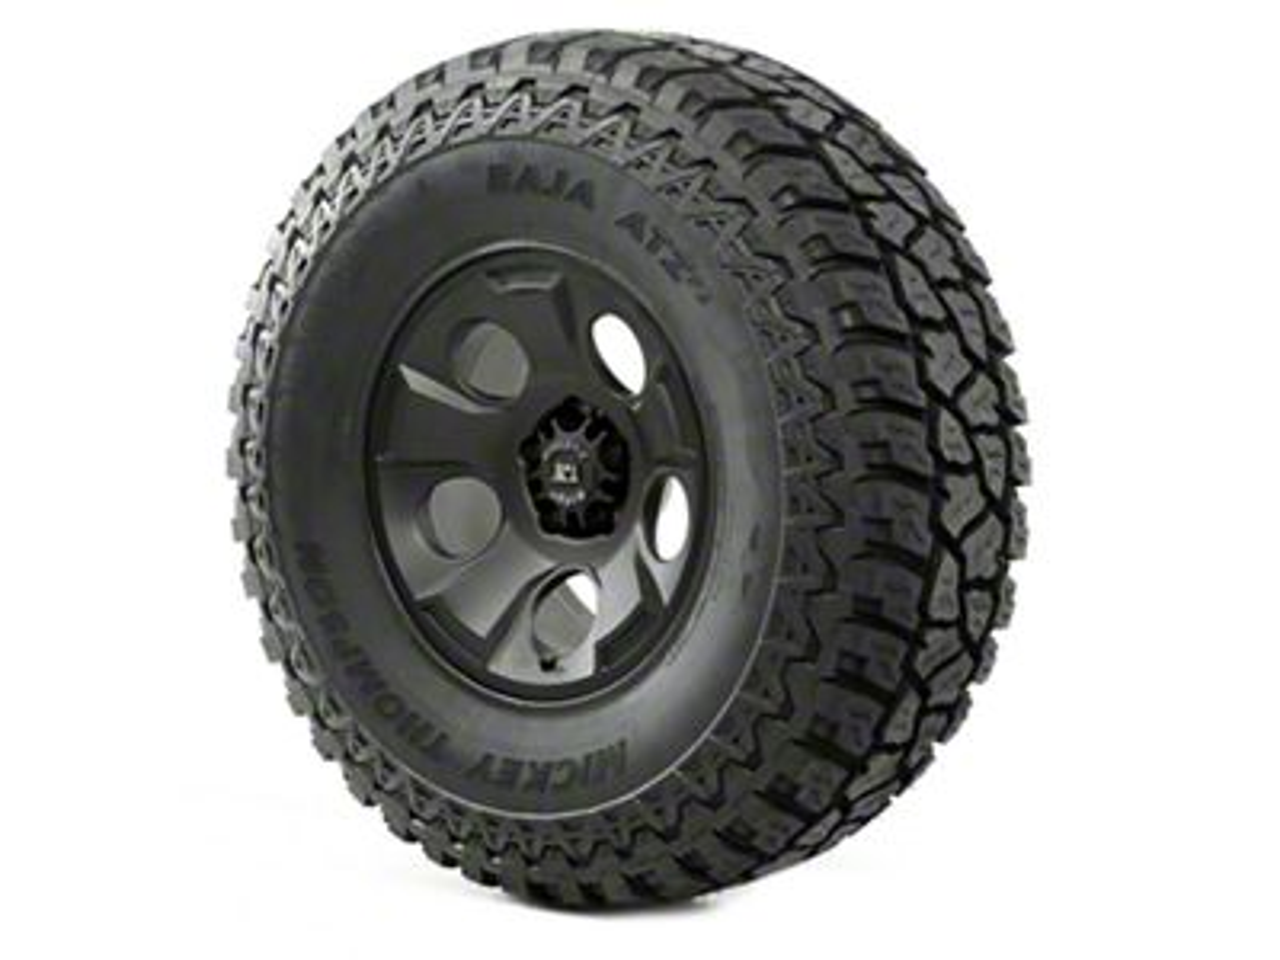 Rugged Ridge Drakon Wheel 17x9 Black Satin and Mickey Thompson ATZ P3 37x12.50x17 Tire (07-18 Jeep Wrangler JK)